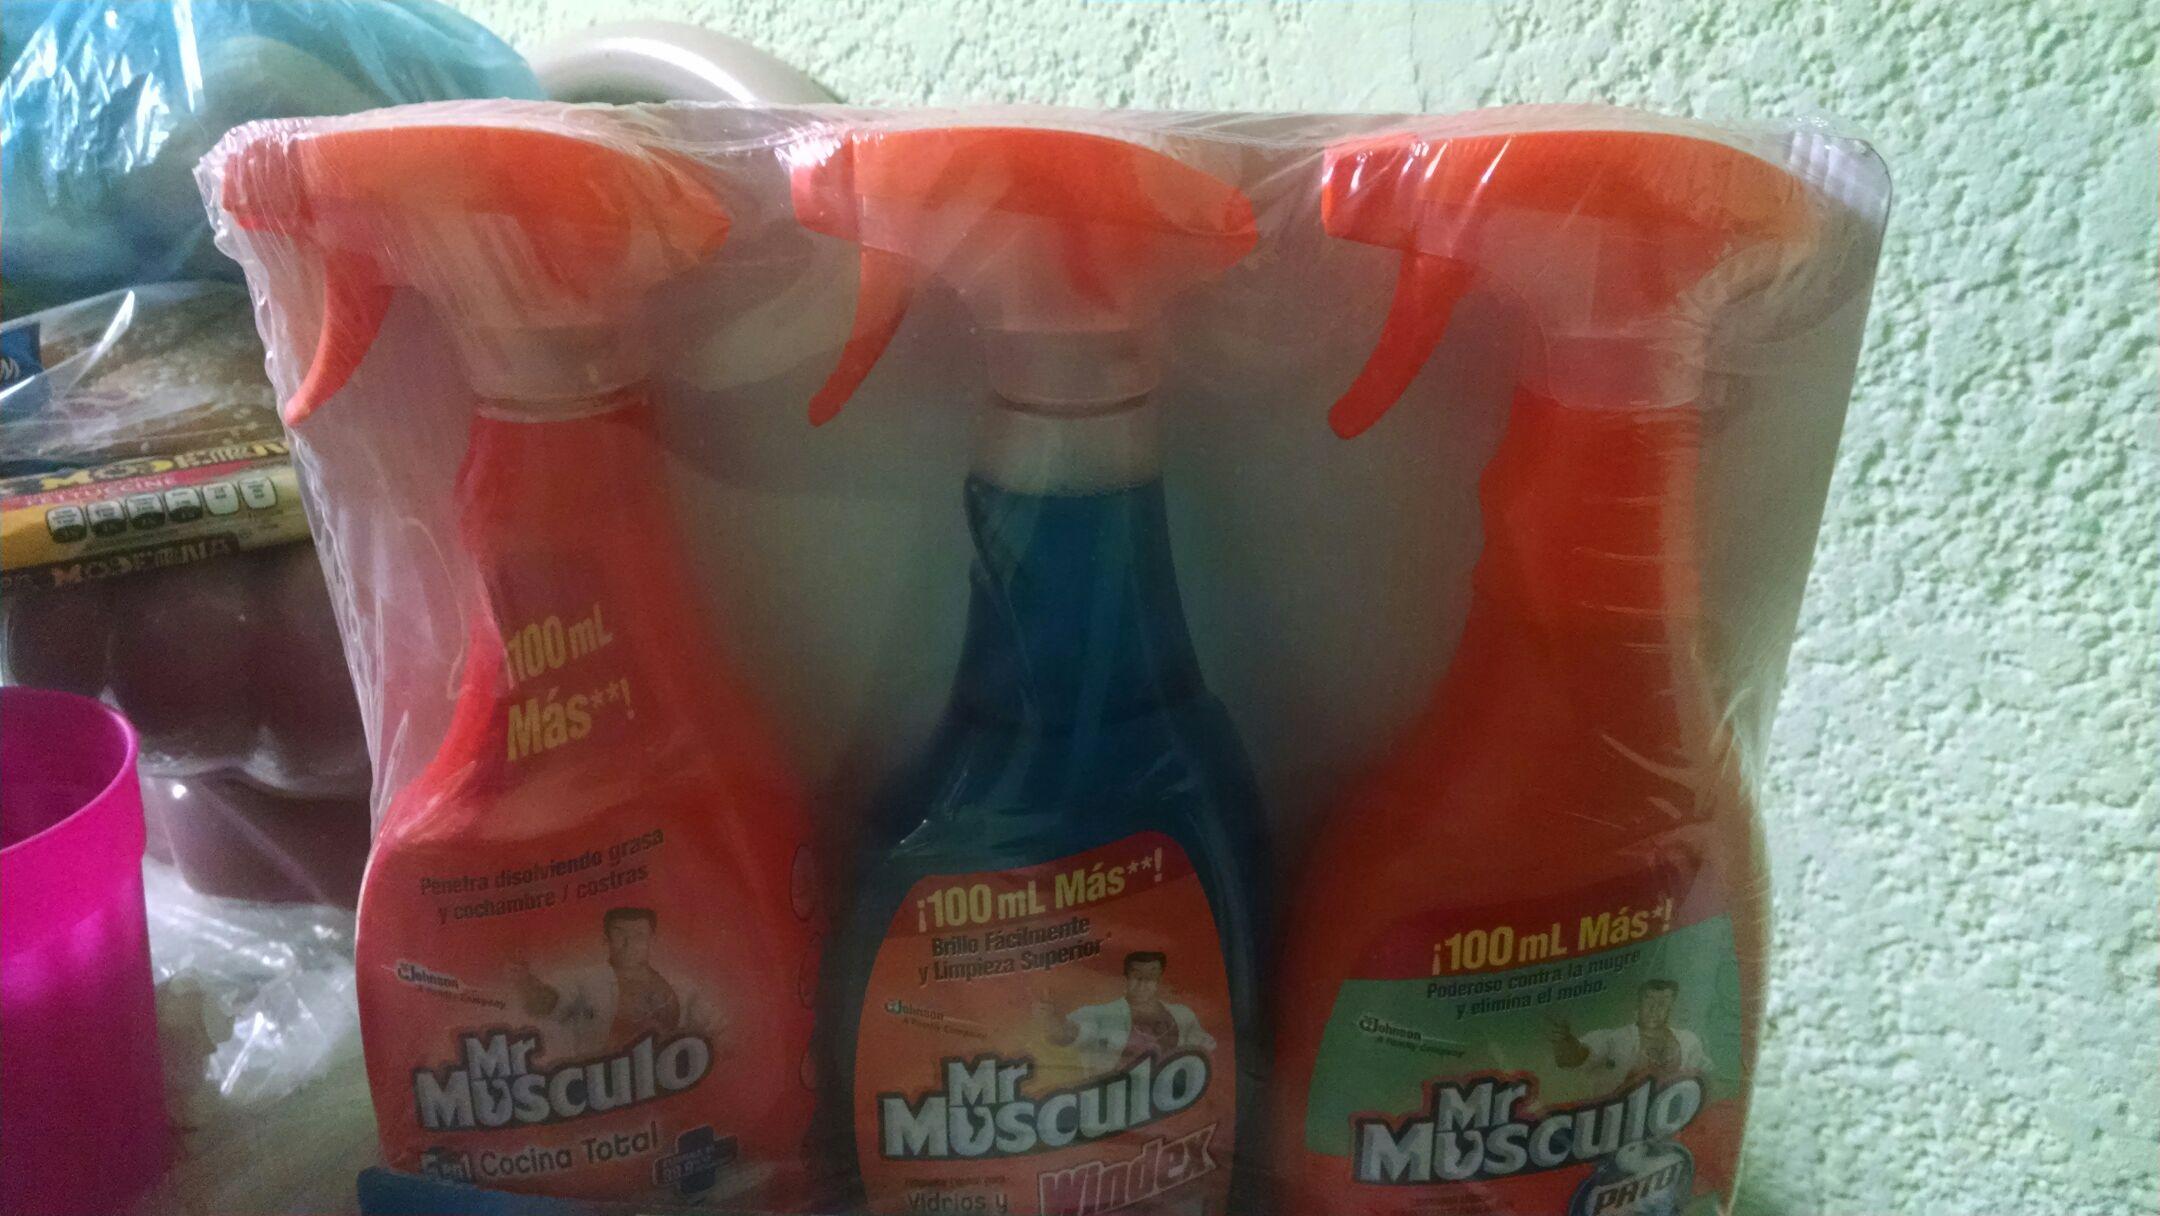 Walmart San Pedro: Mr músculo 3 pack